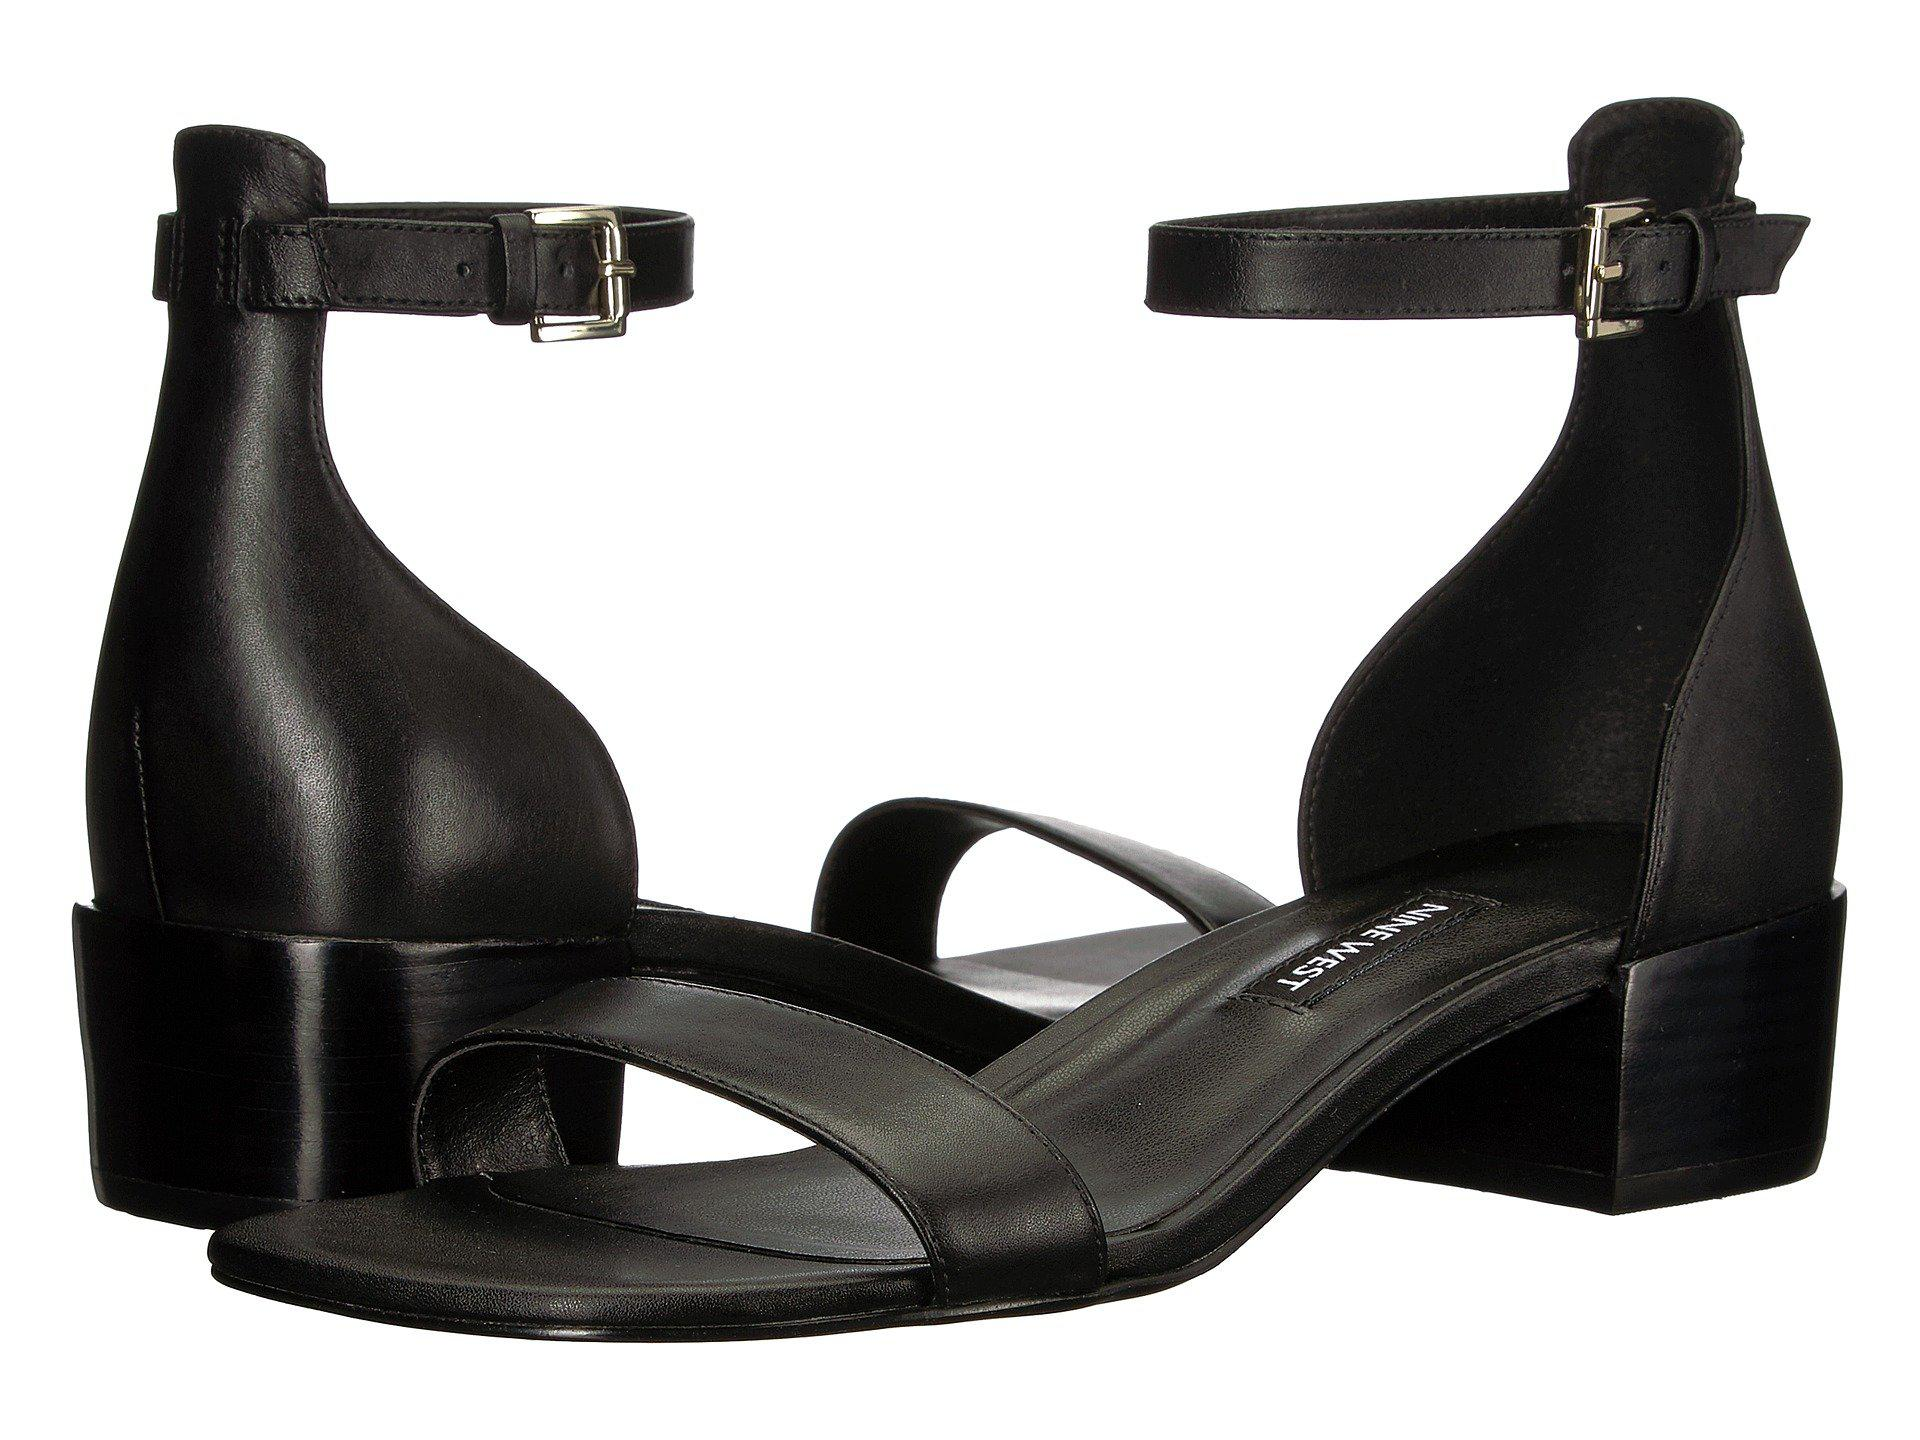 07a425cde0f Lyst - Nine West Xuxa Block Heel Sandal in Black - Save 23%